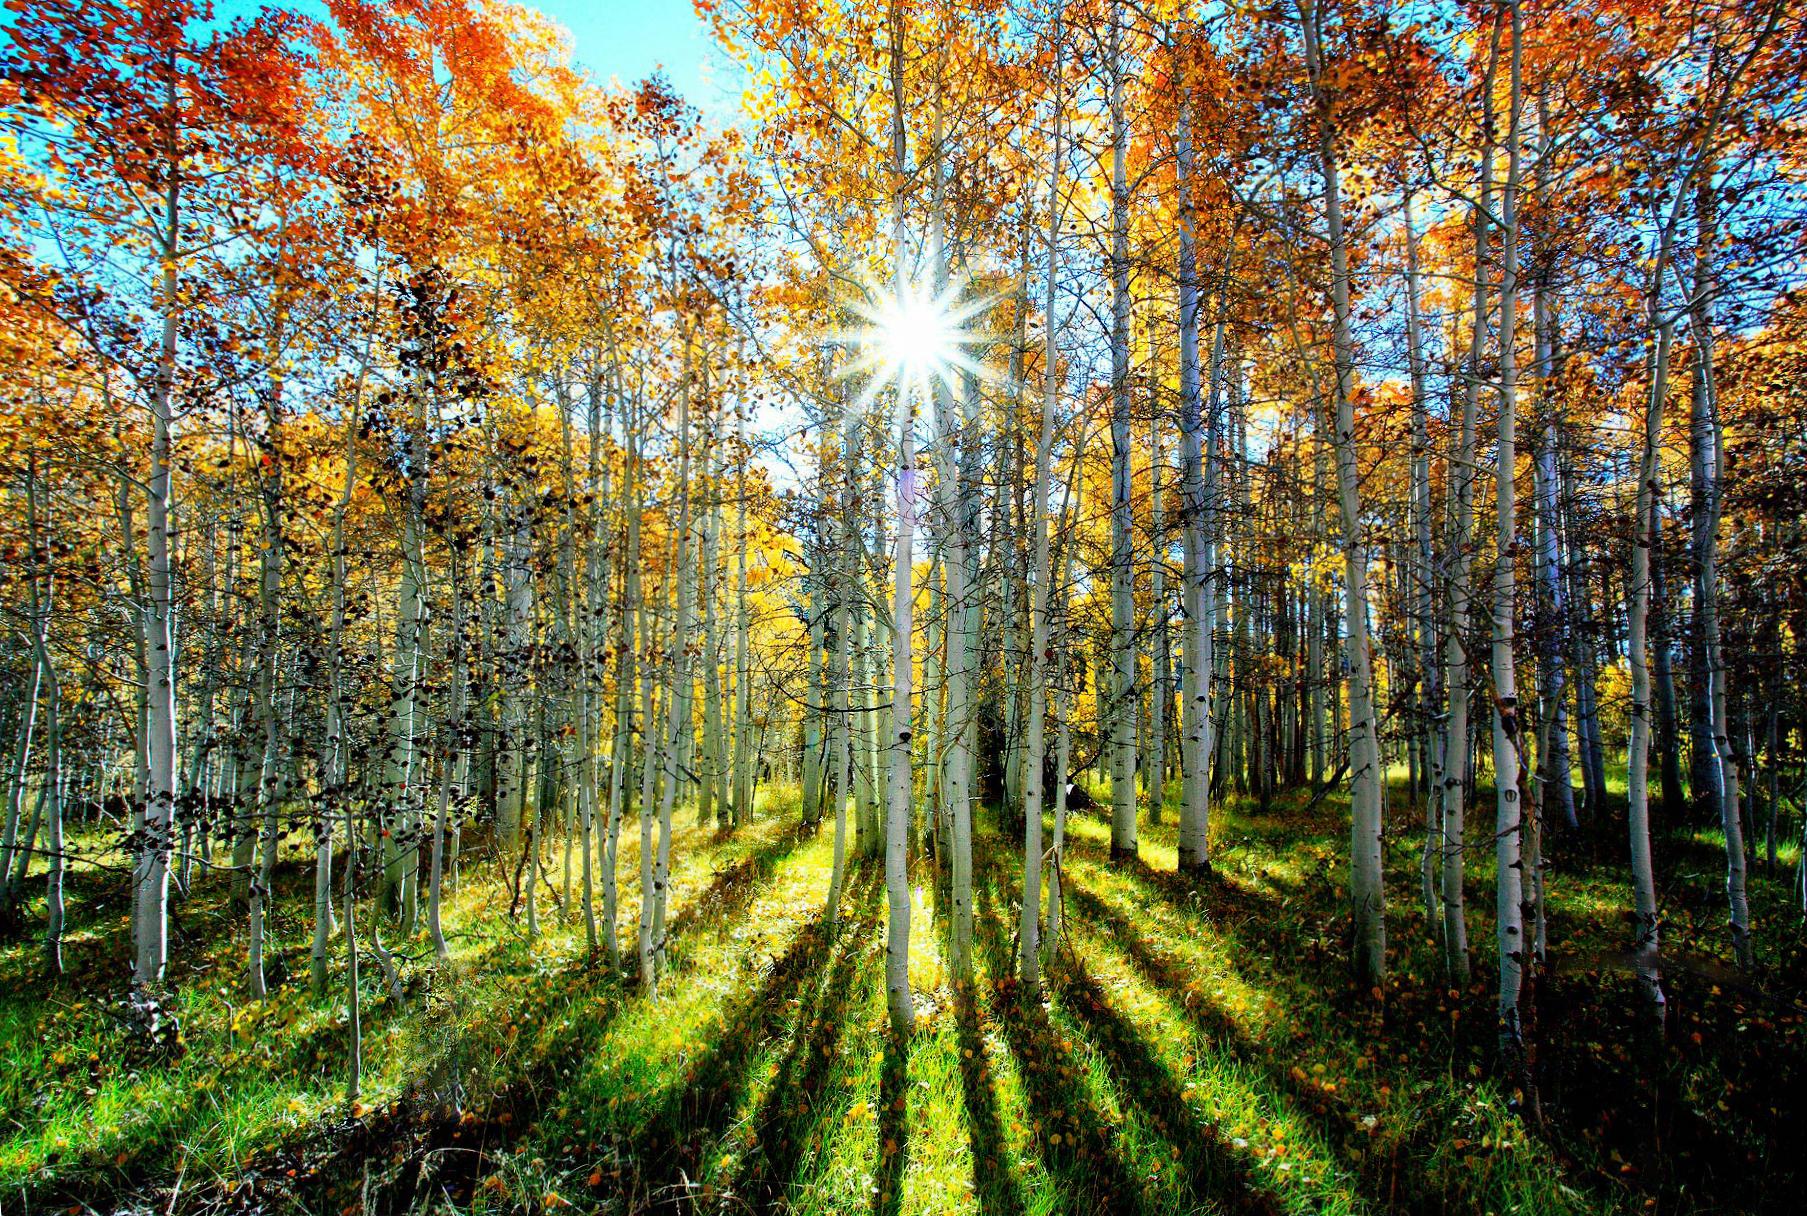 Rainbow Woods, Happy Aspens by Pacheco